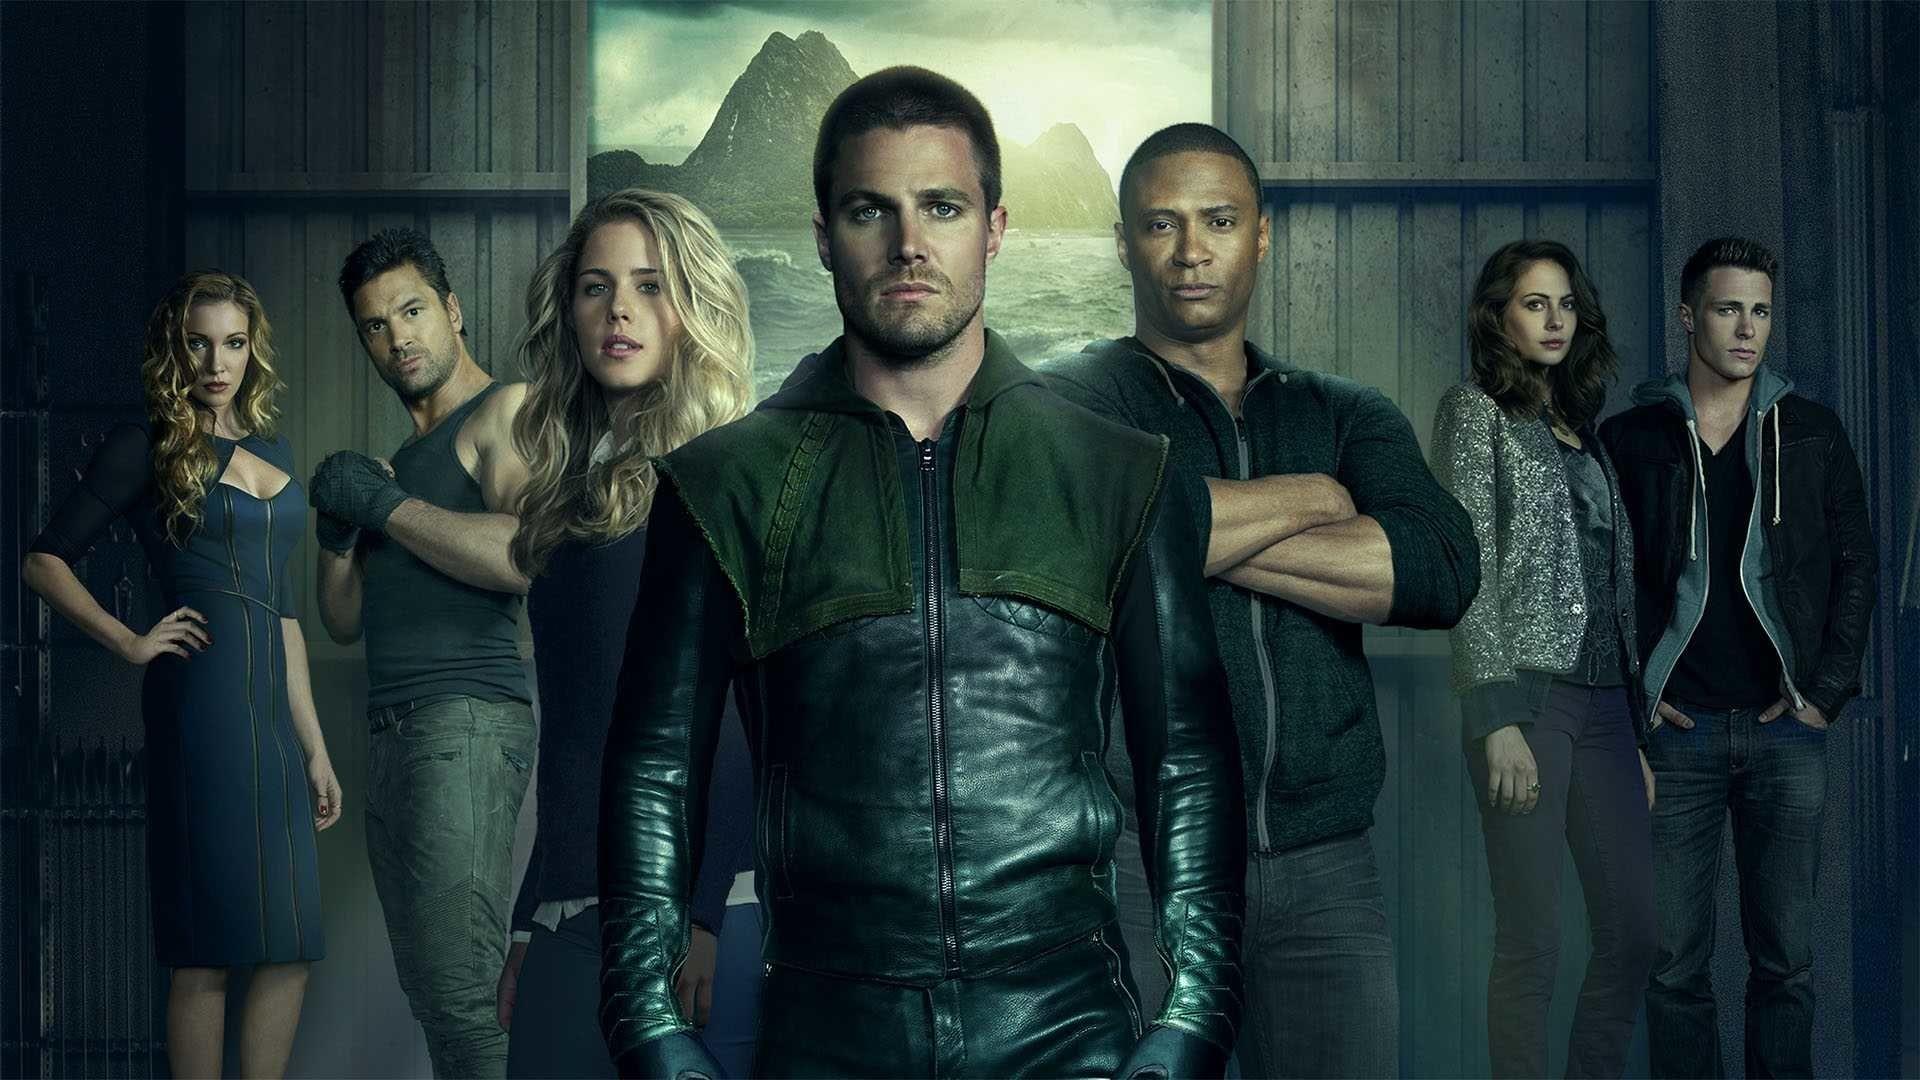 'Arrow' Top 10 Villains